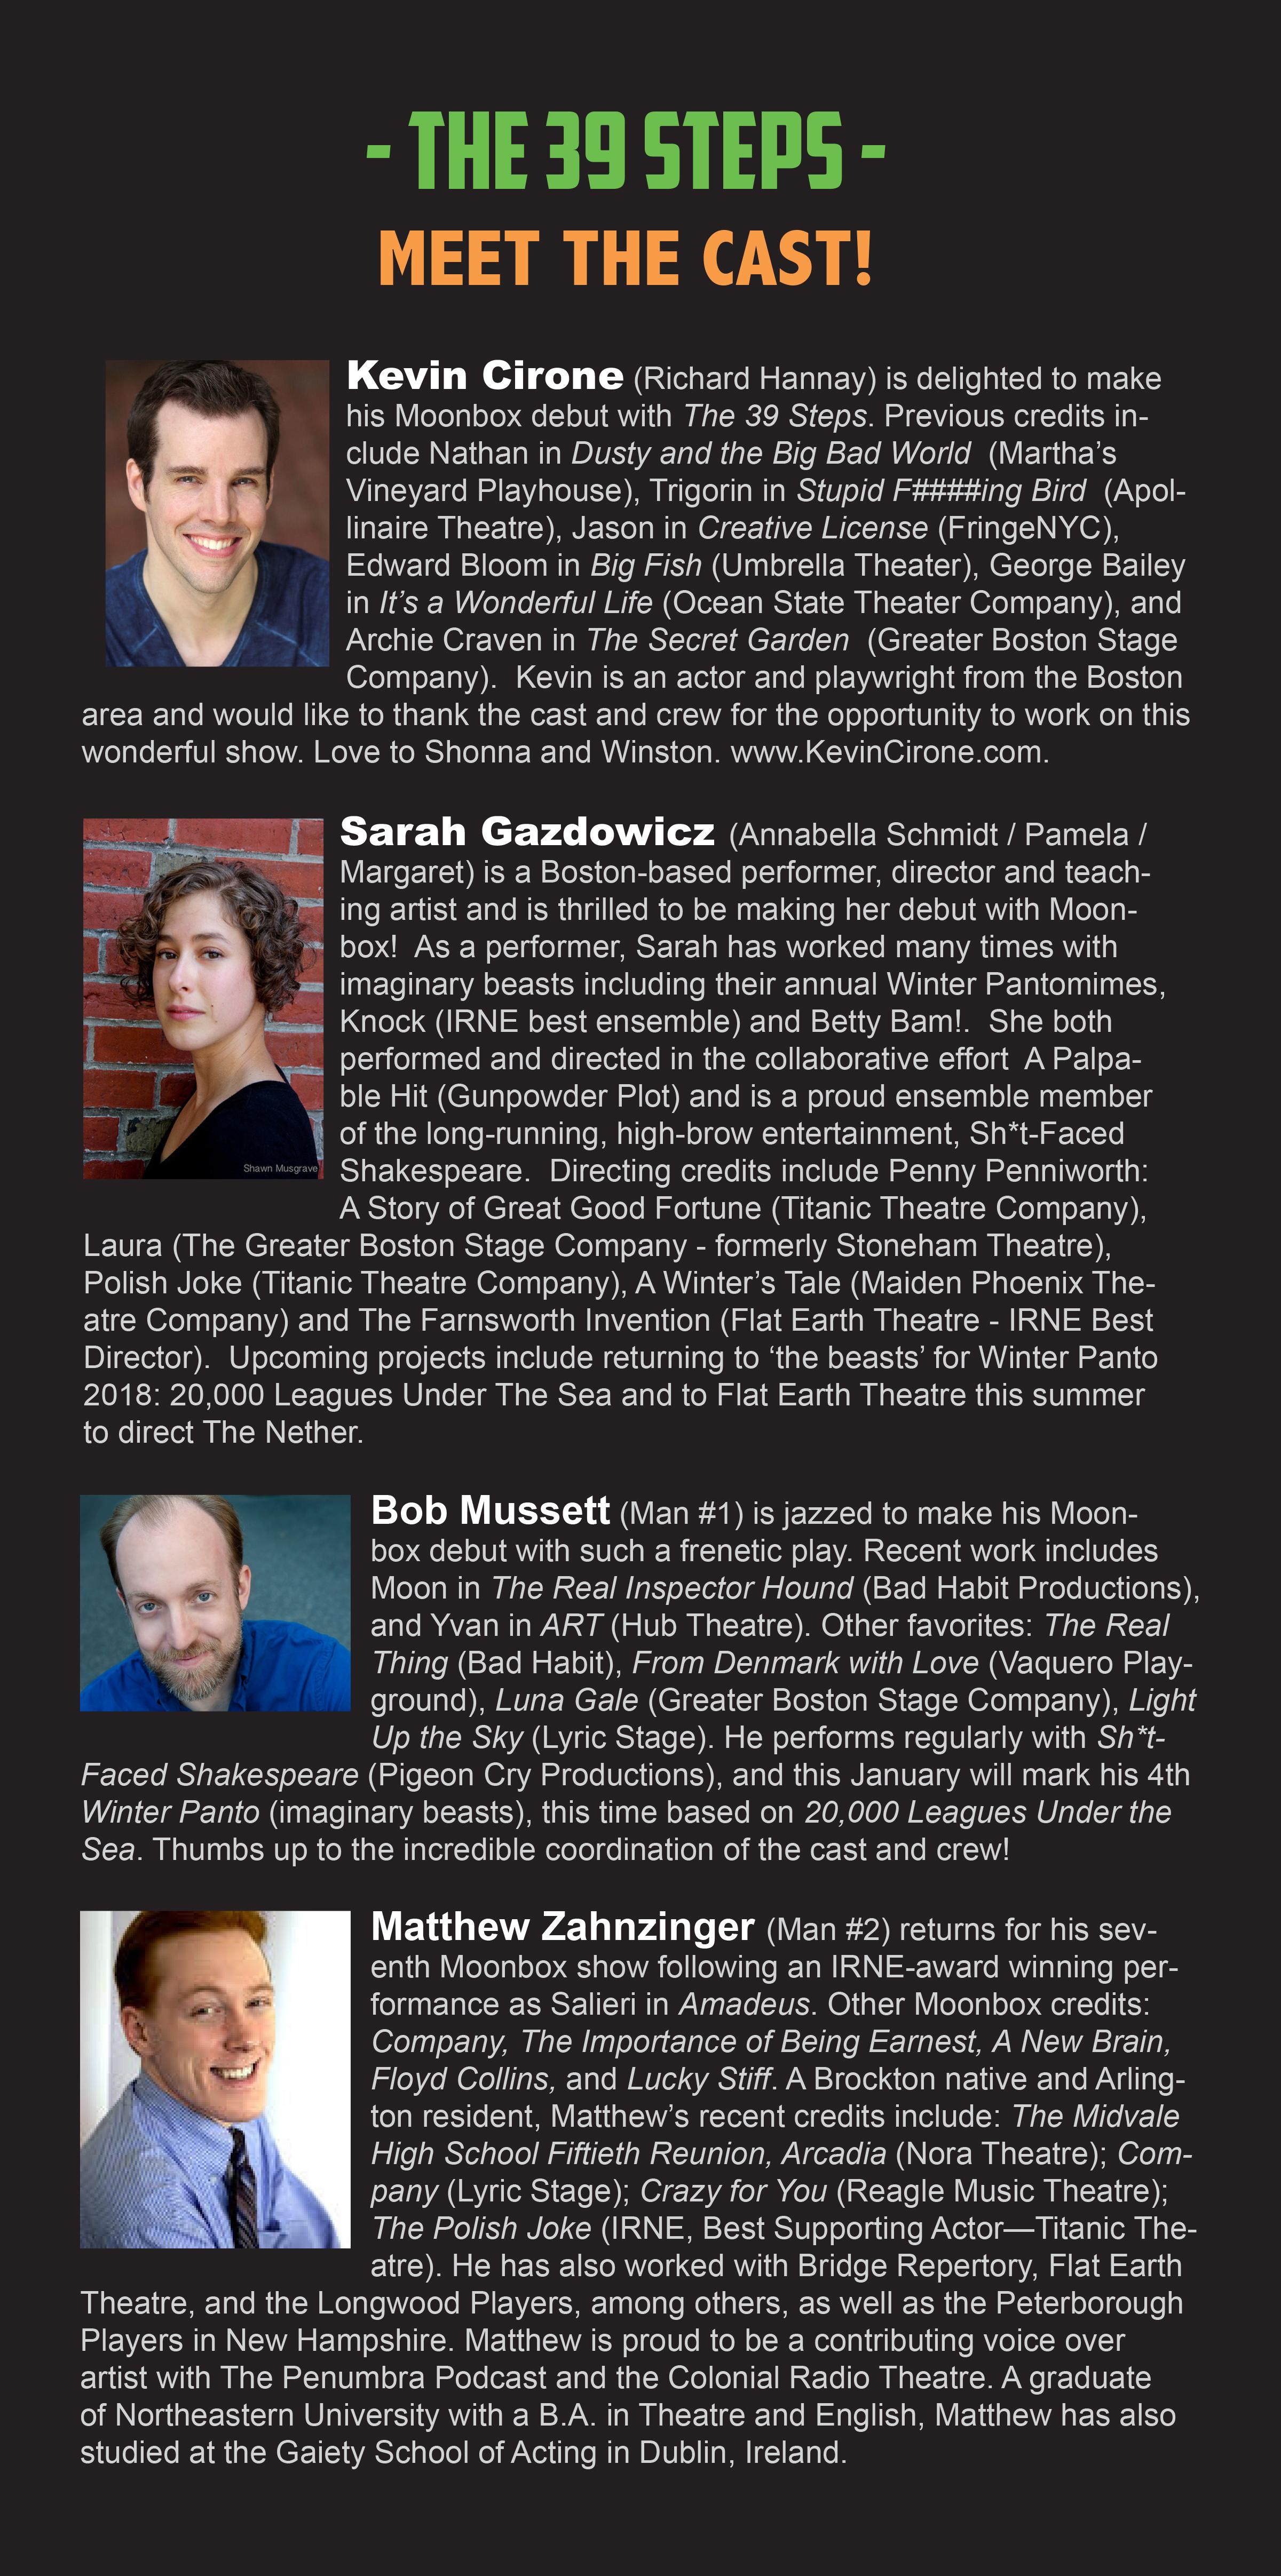 39S cast website.jpg